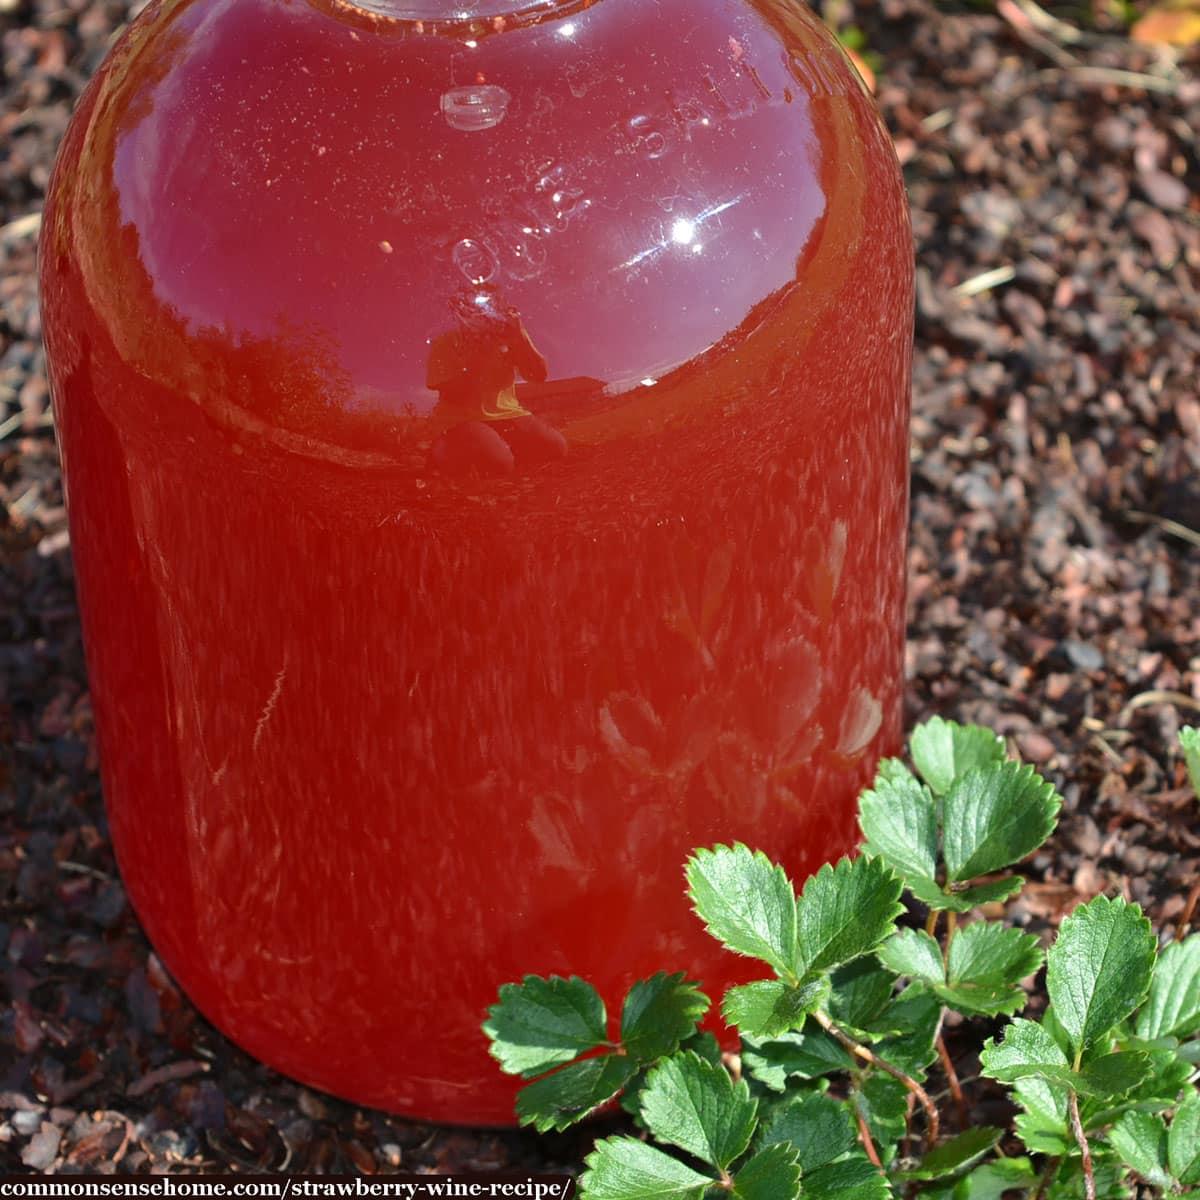 gallon jug of homemade strawberry wine